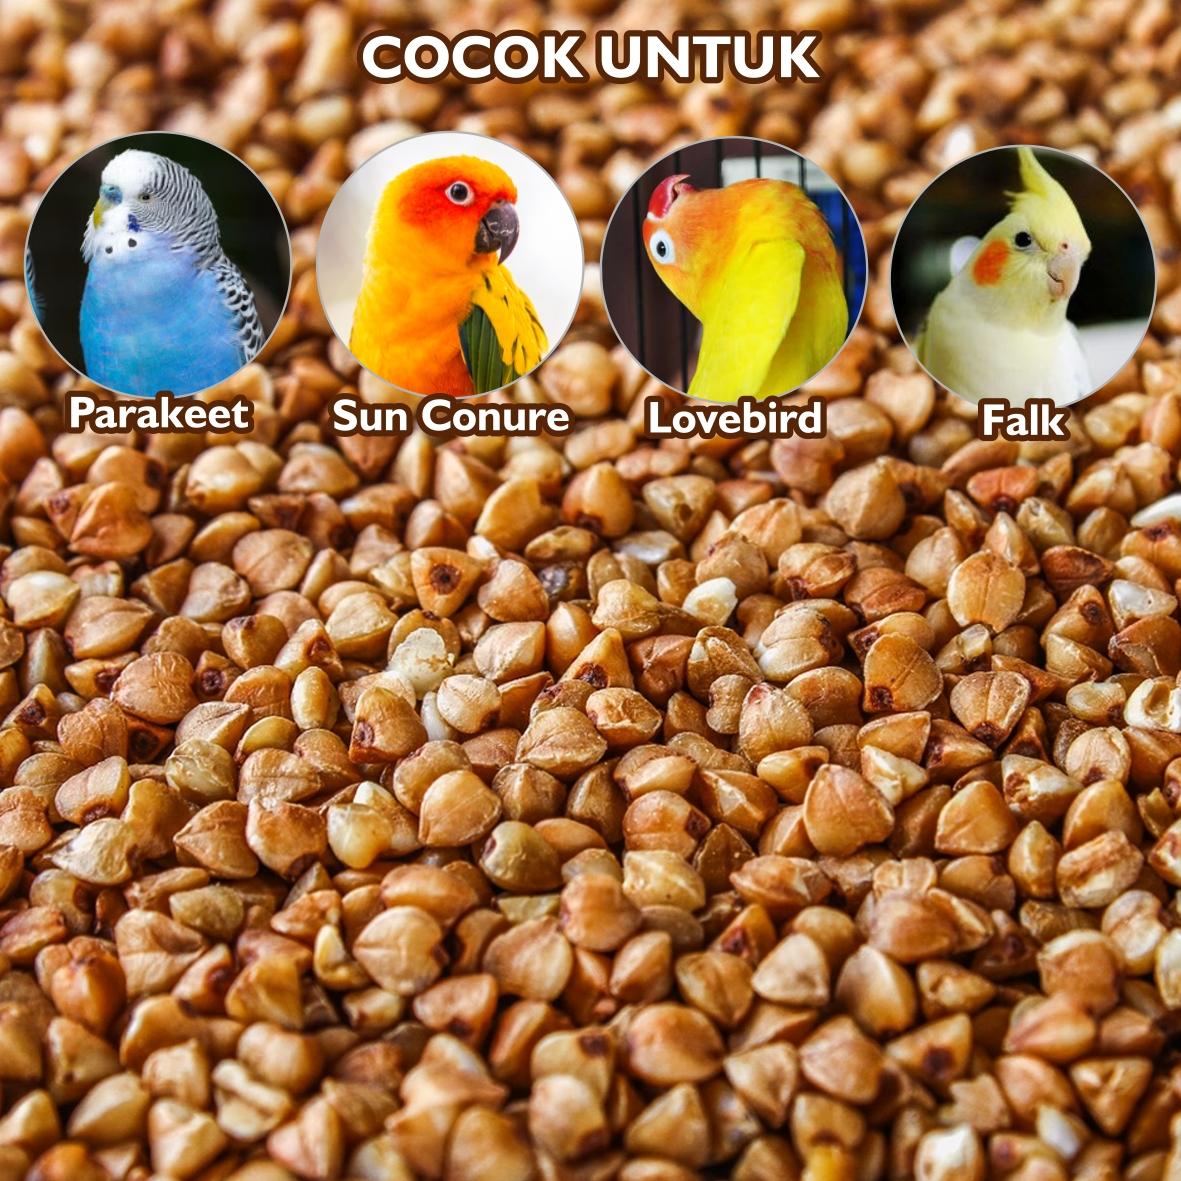 Organic Buckwheat Pakan Makanan Burung Lovebird Parakeet Parrot Paruh Bengkok Kenari Sun Conure Parkit Nuri Bakwet Falk Ternak Breeding Harian Buckrf Sempati Bird Shop